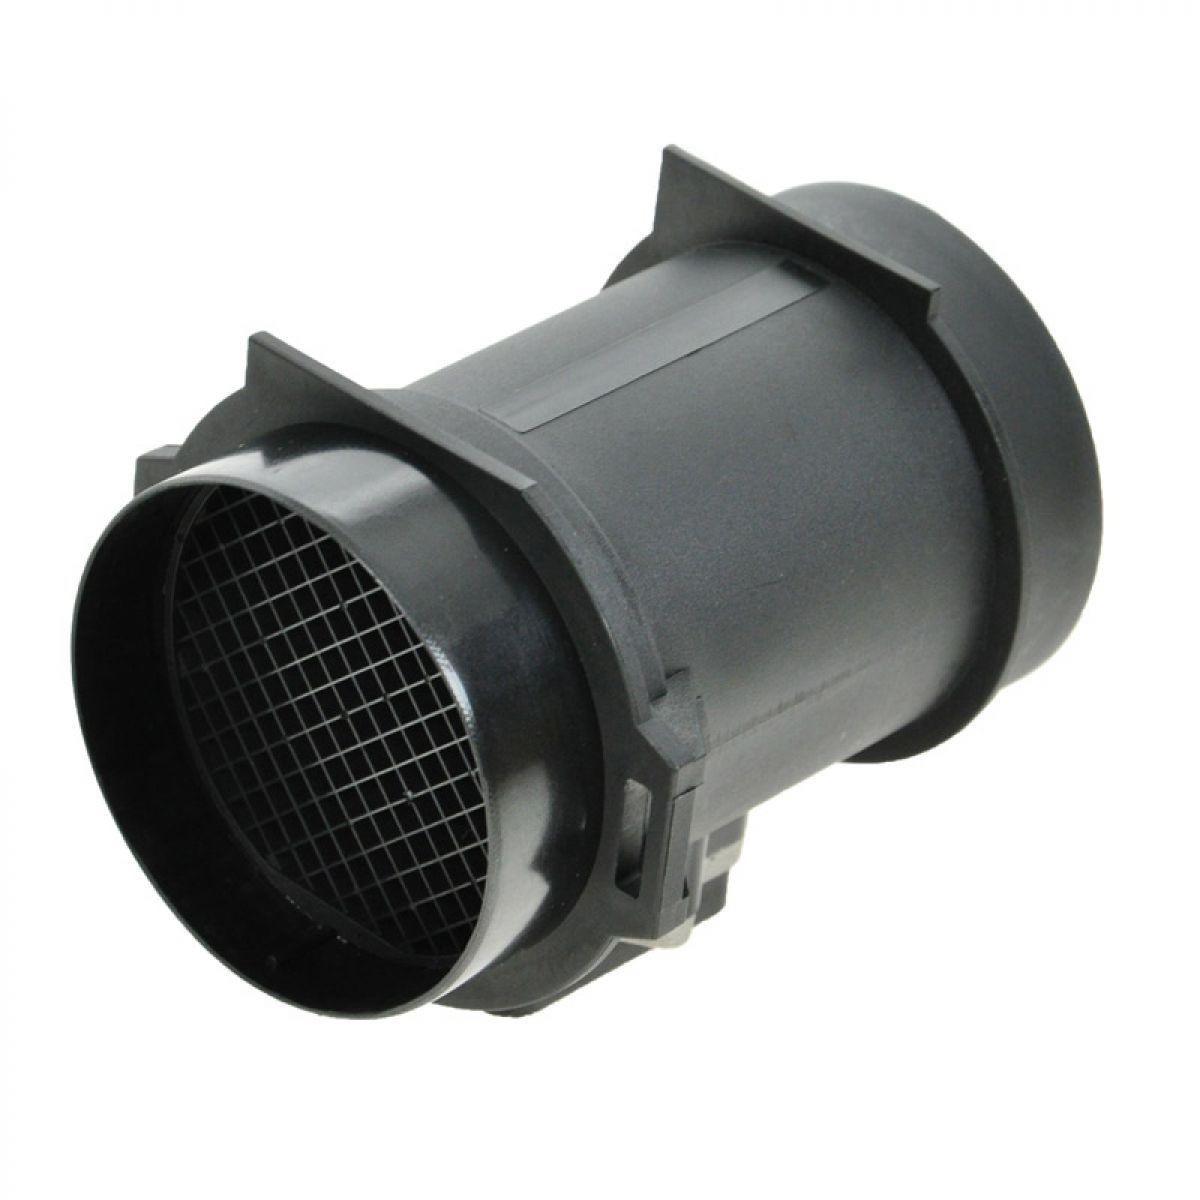 Sensor Maf Bmw 323i 328i 528i M3 Z3 96 97 98 99 2000